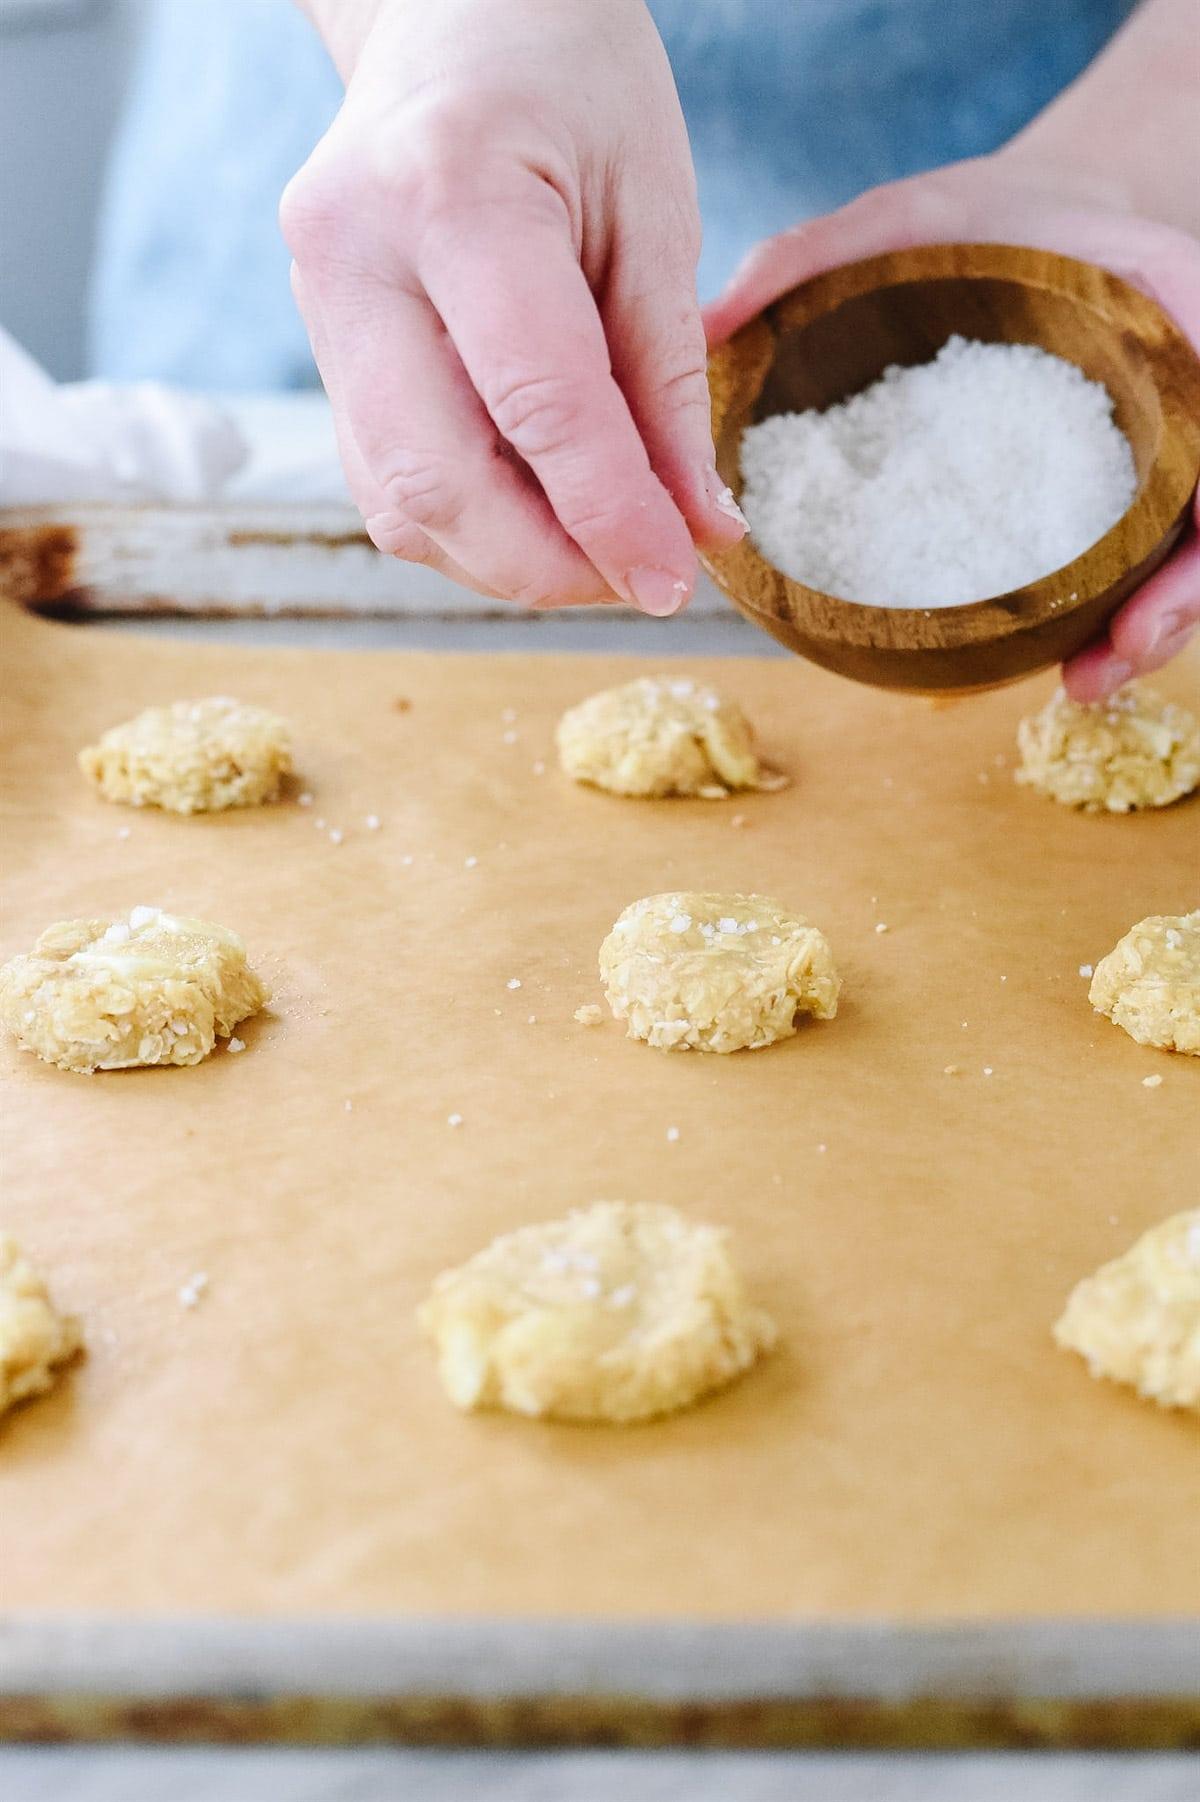 adding salt to cookies